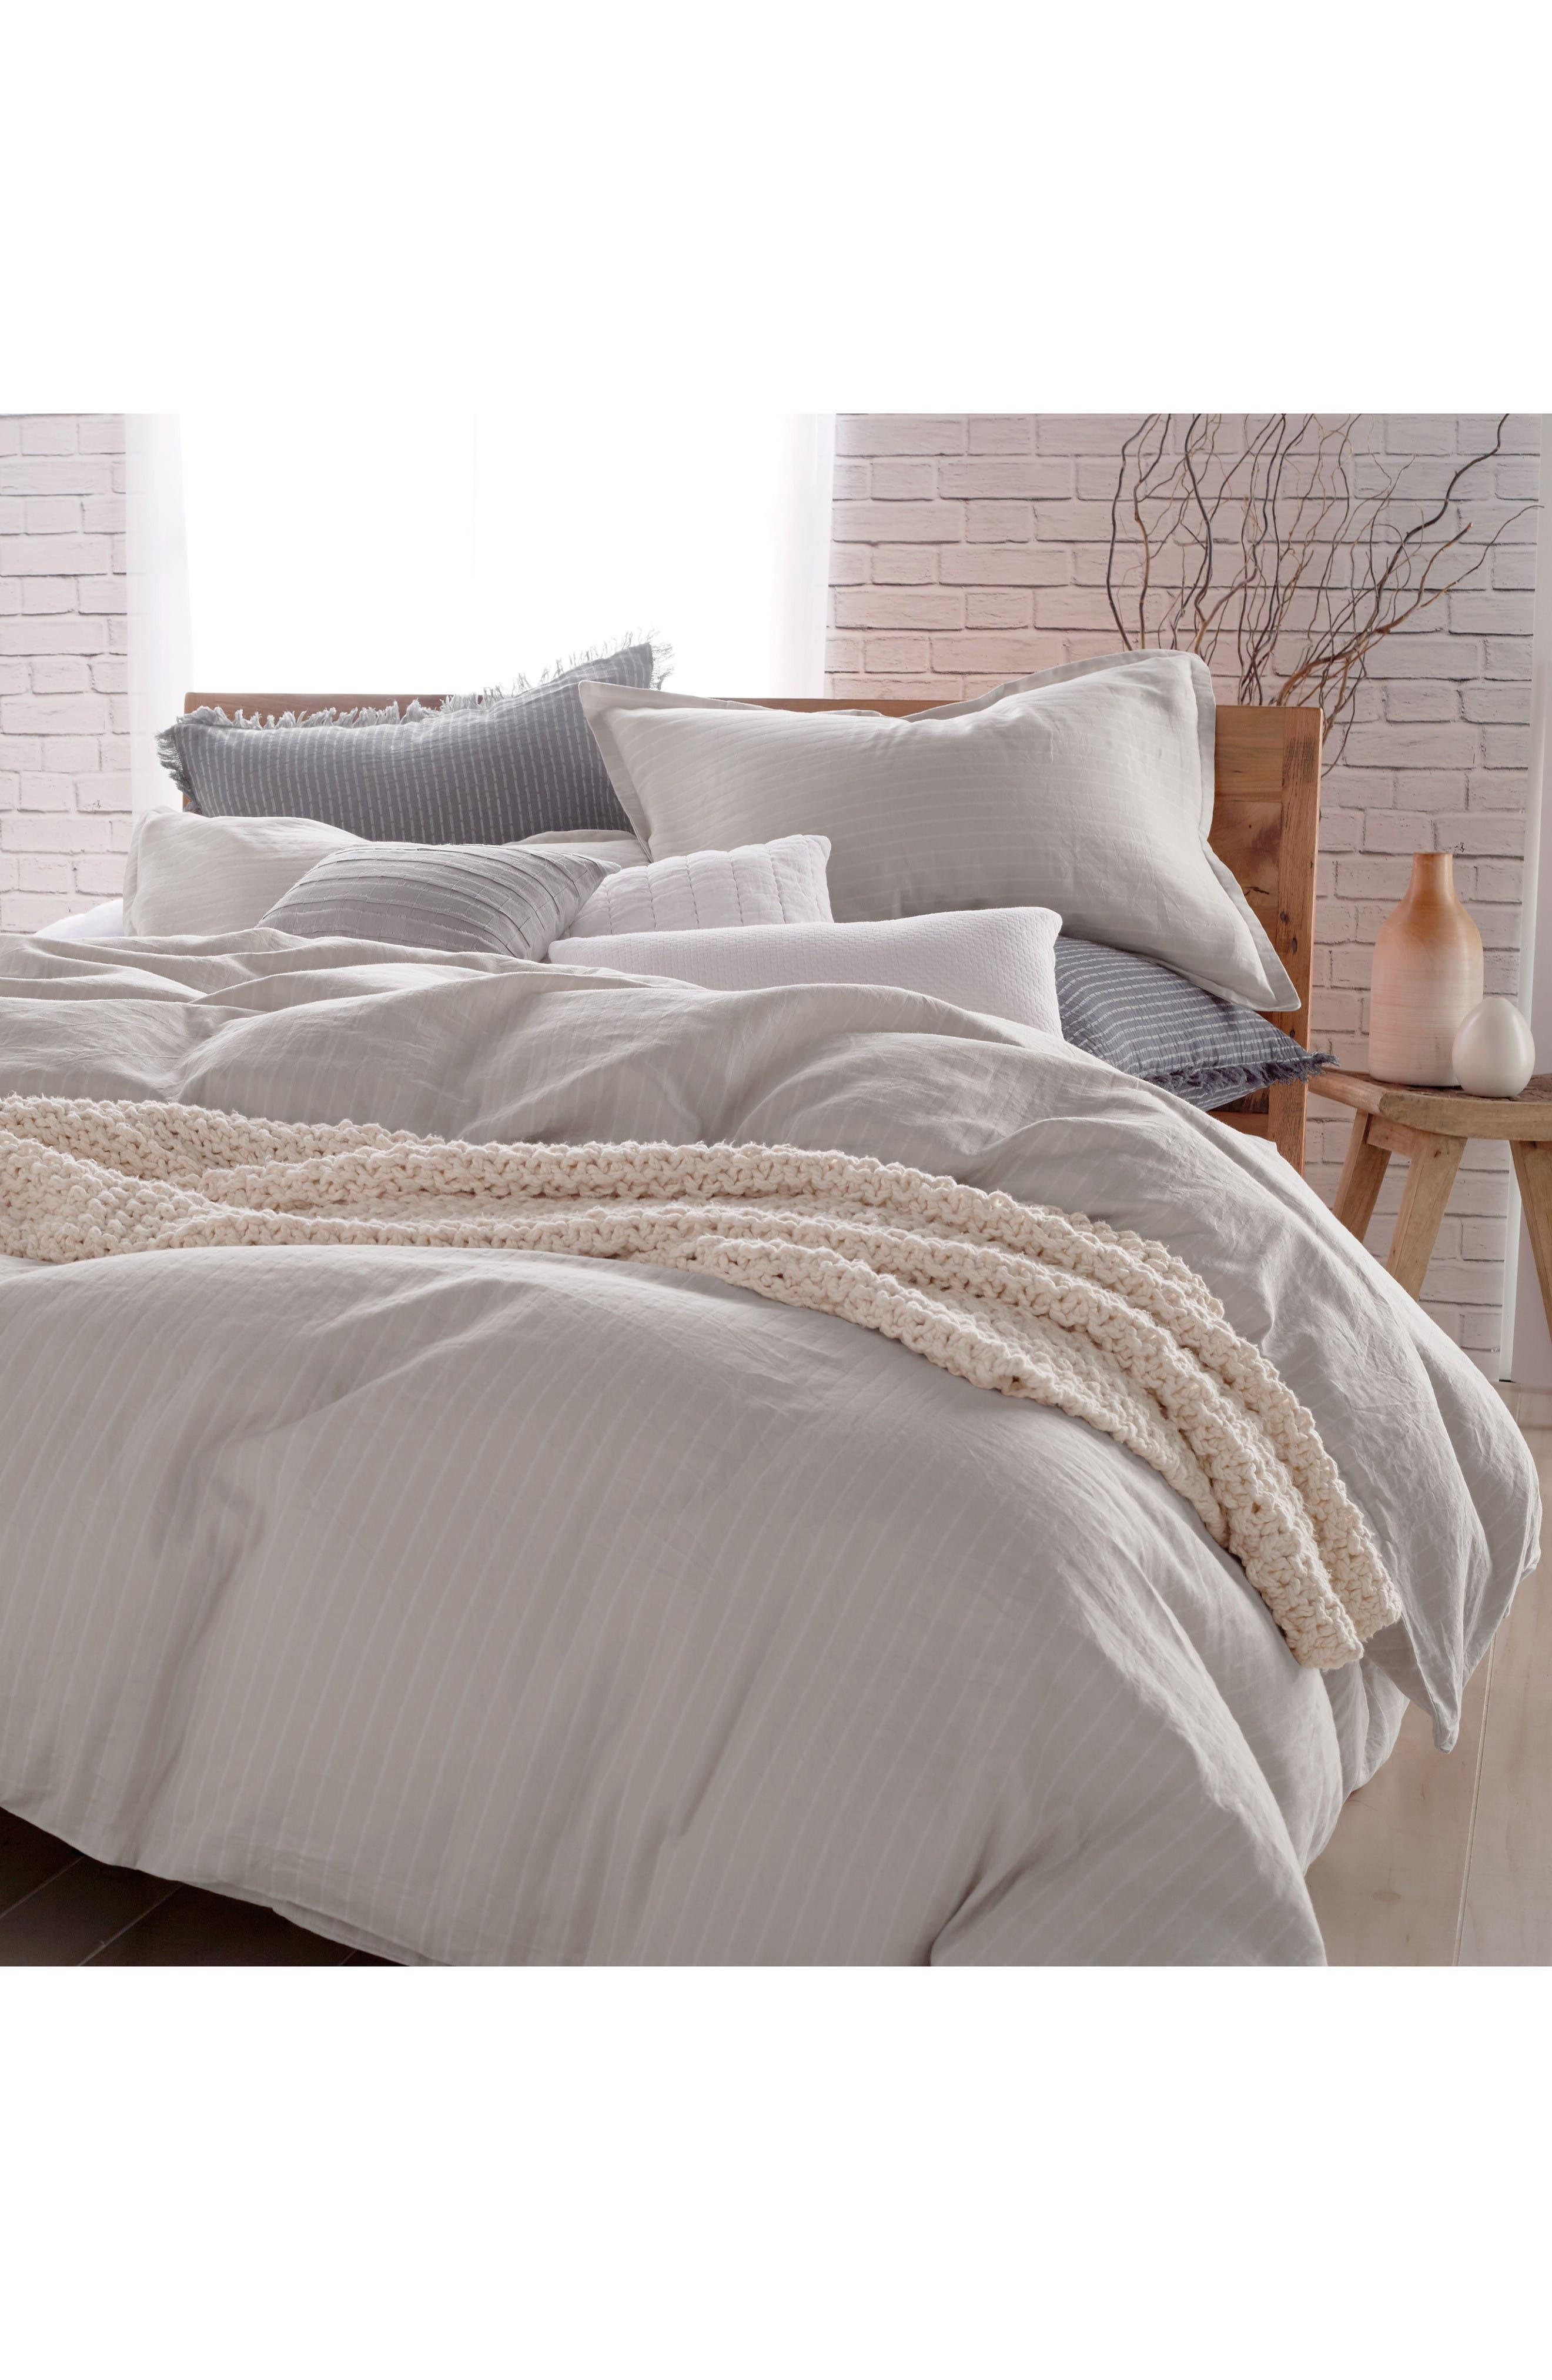 dkny pure comfy platinum duvet cover nordstrom dkny bedding set